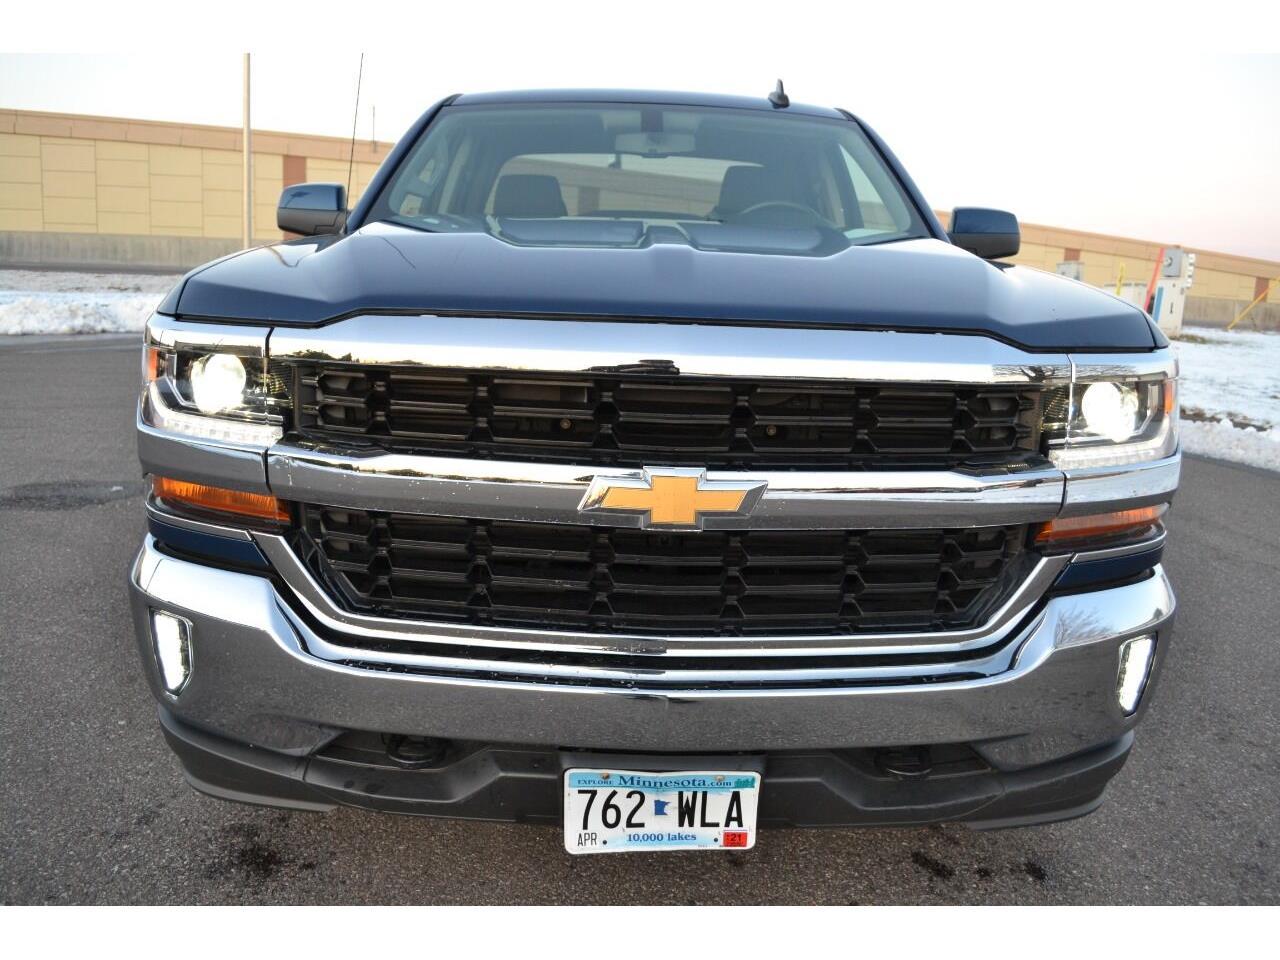 2017 Chevrolet Silverado (CC-1421628) for sale in Ramsey, Minnesota